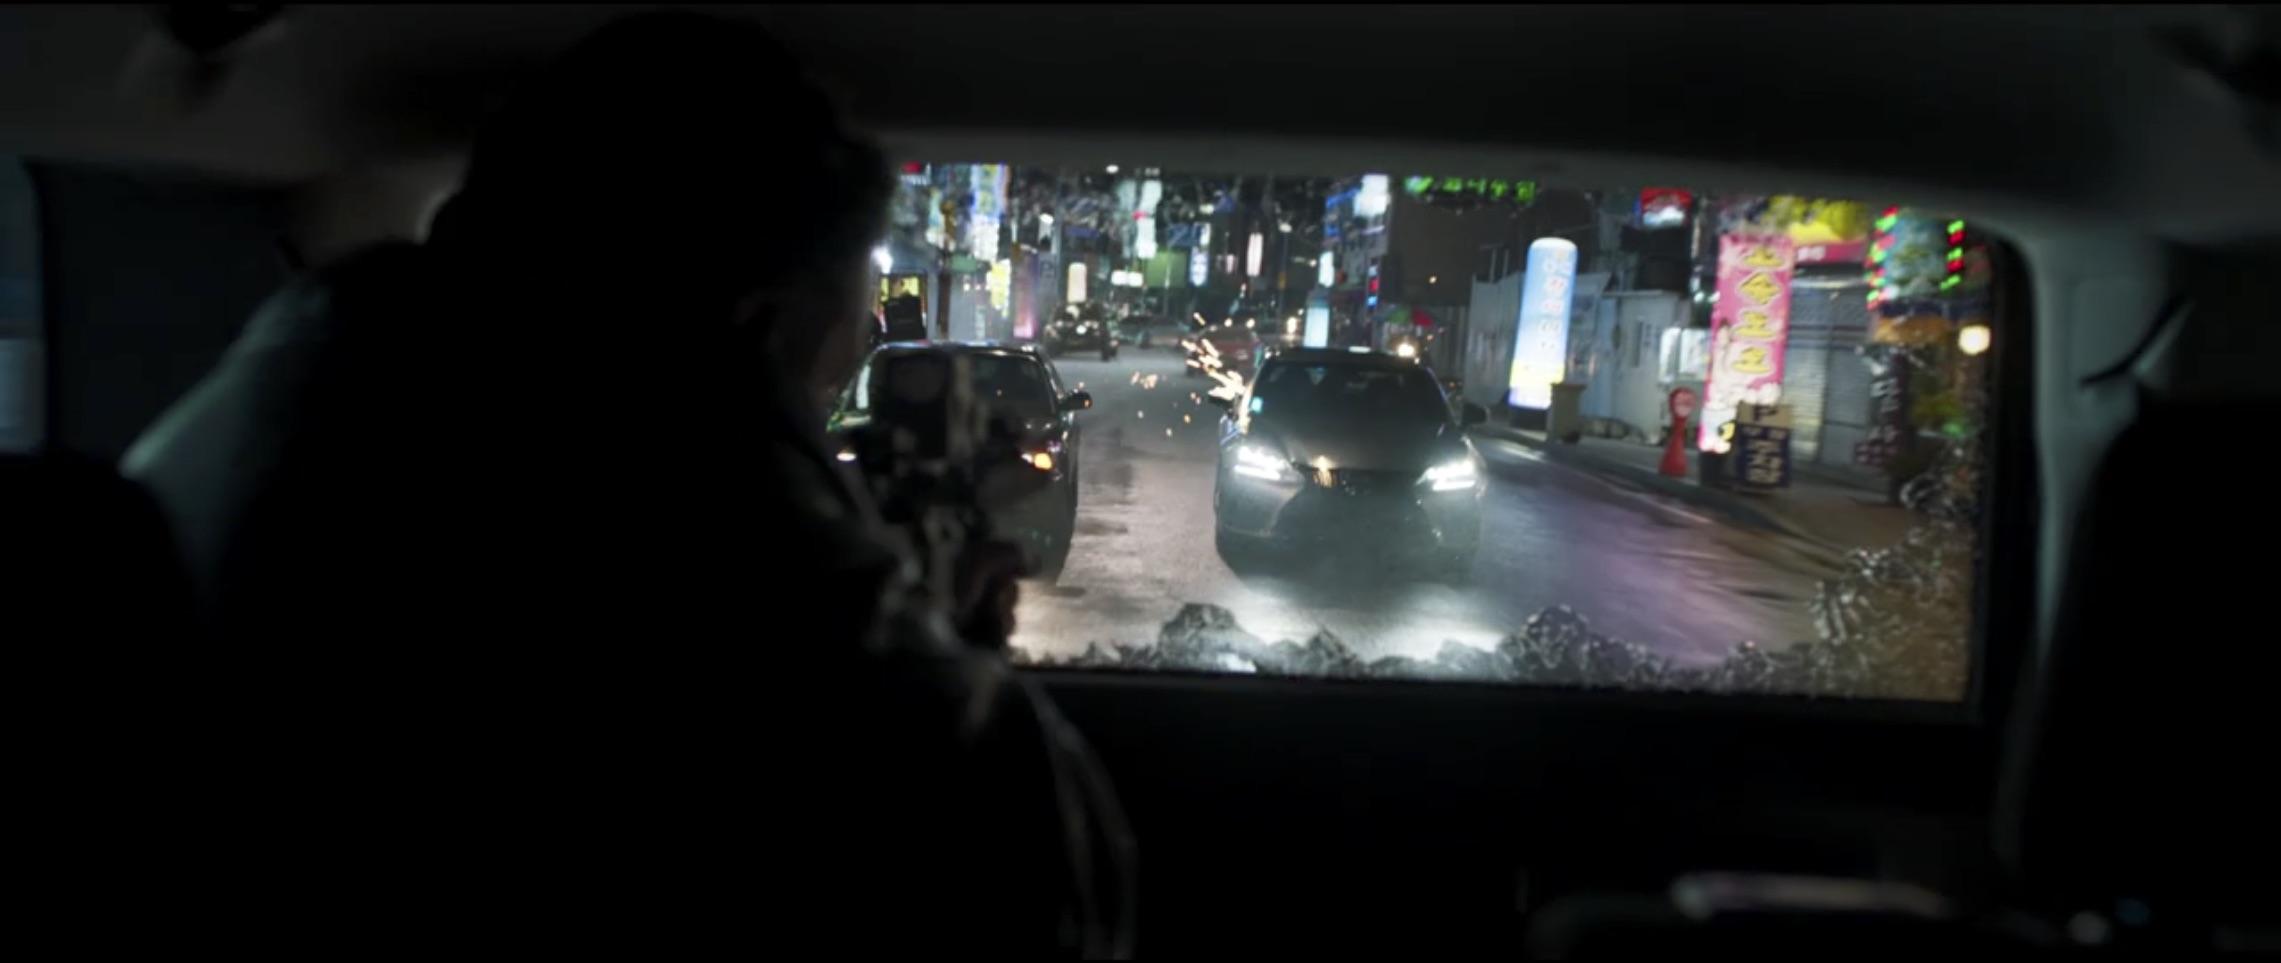 Marvel Black Panther shooting at car chase scene